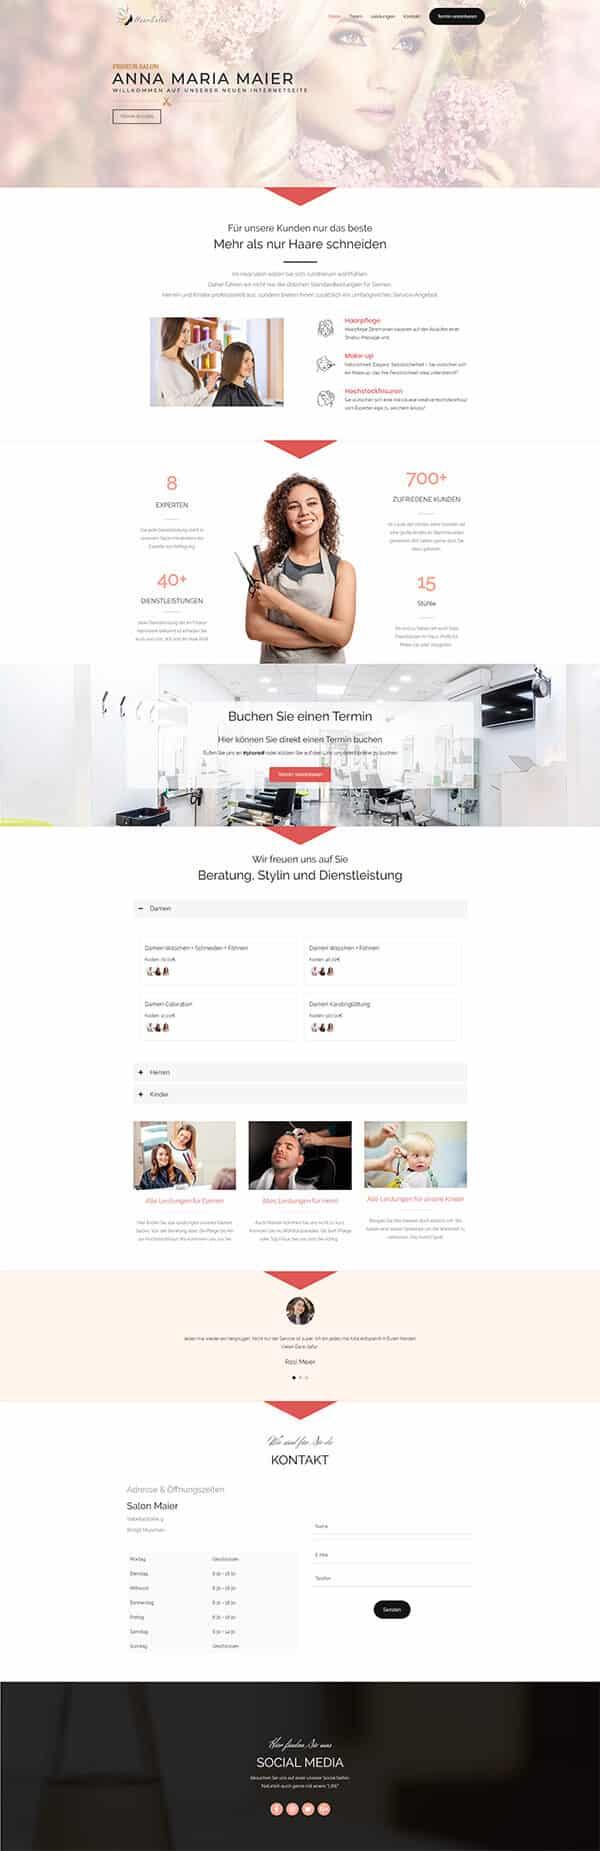 friseur_website_komplett_600